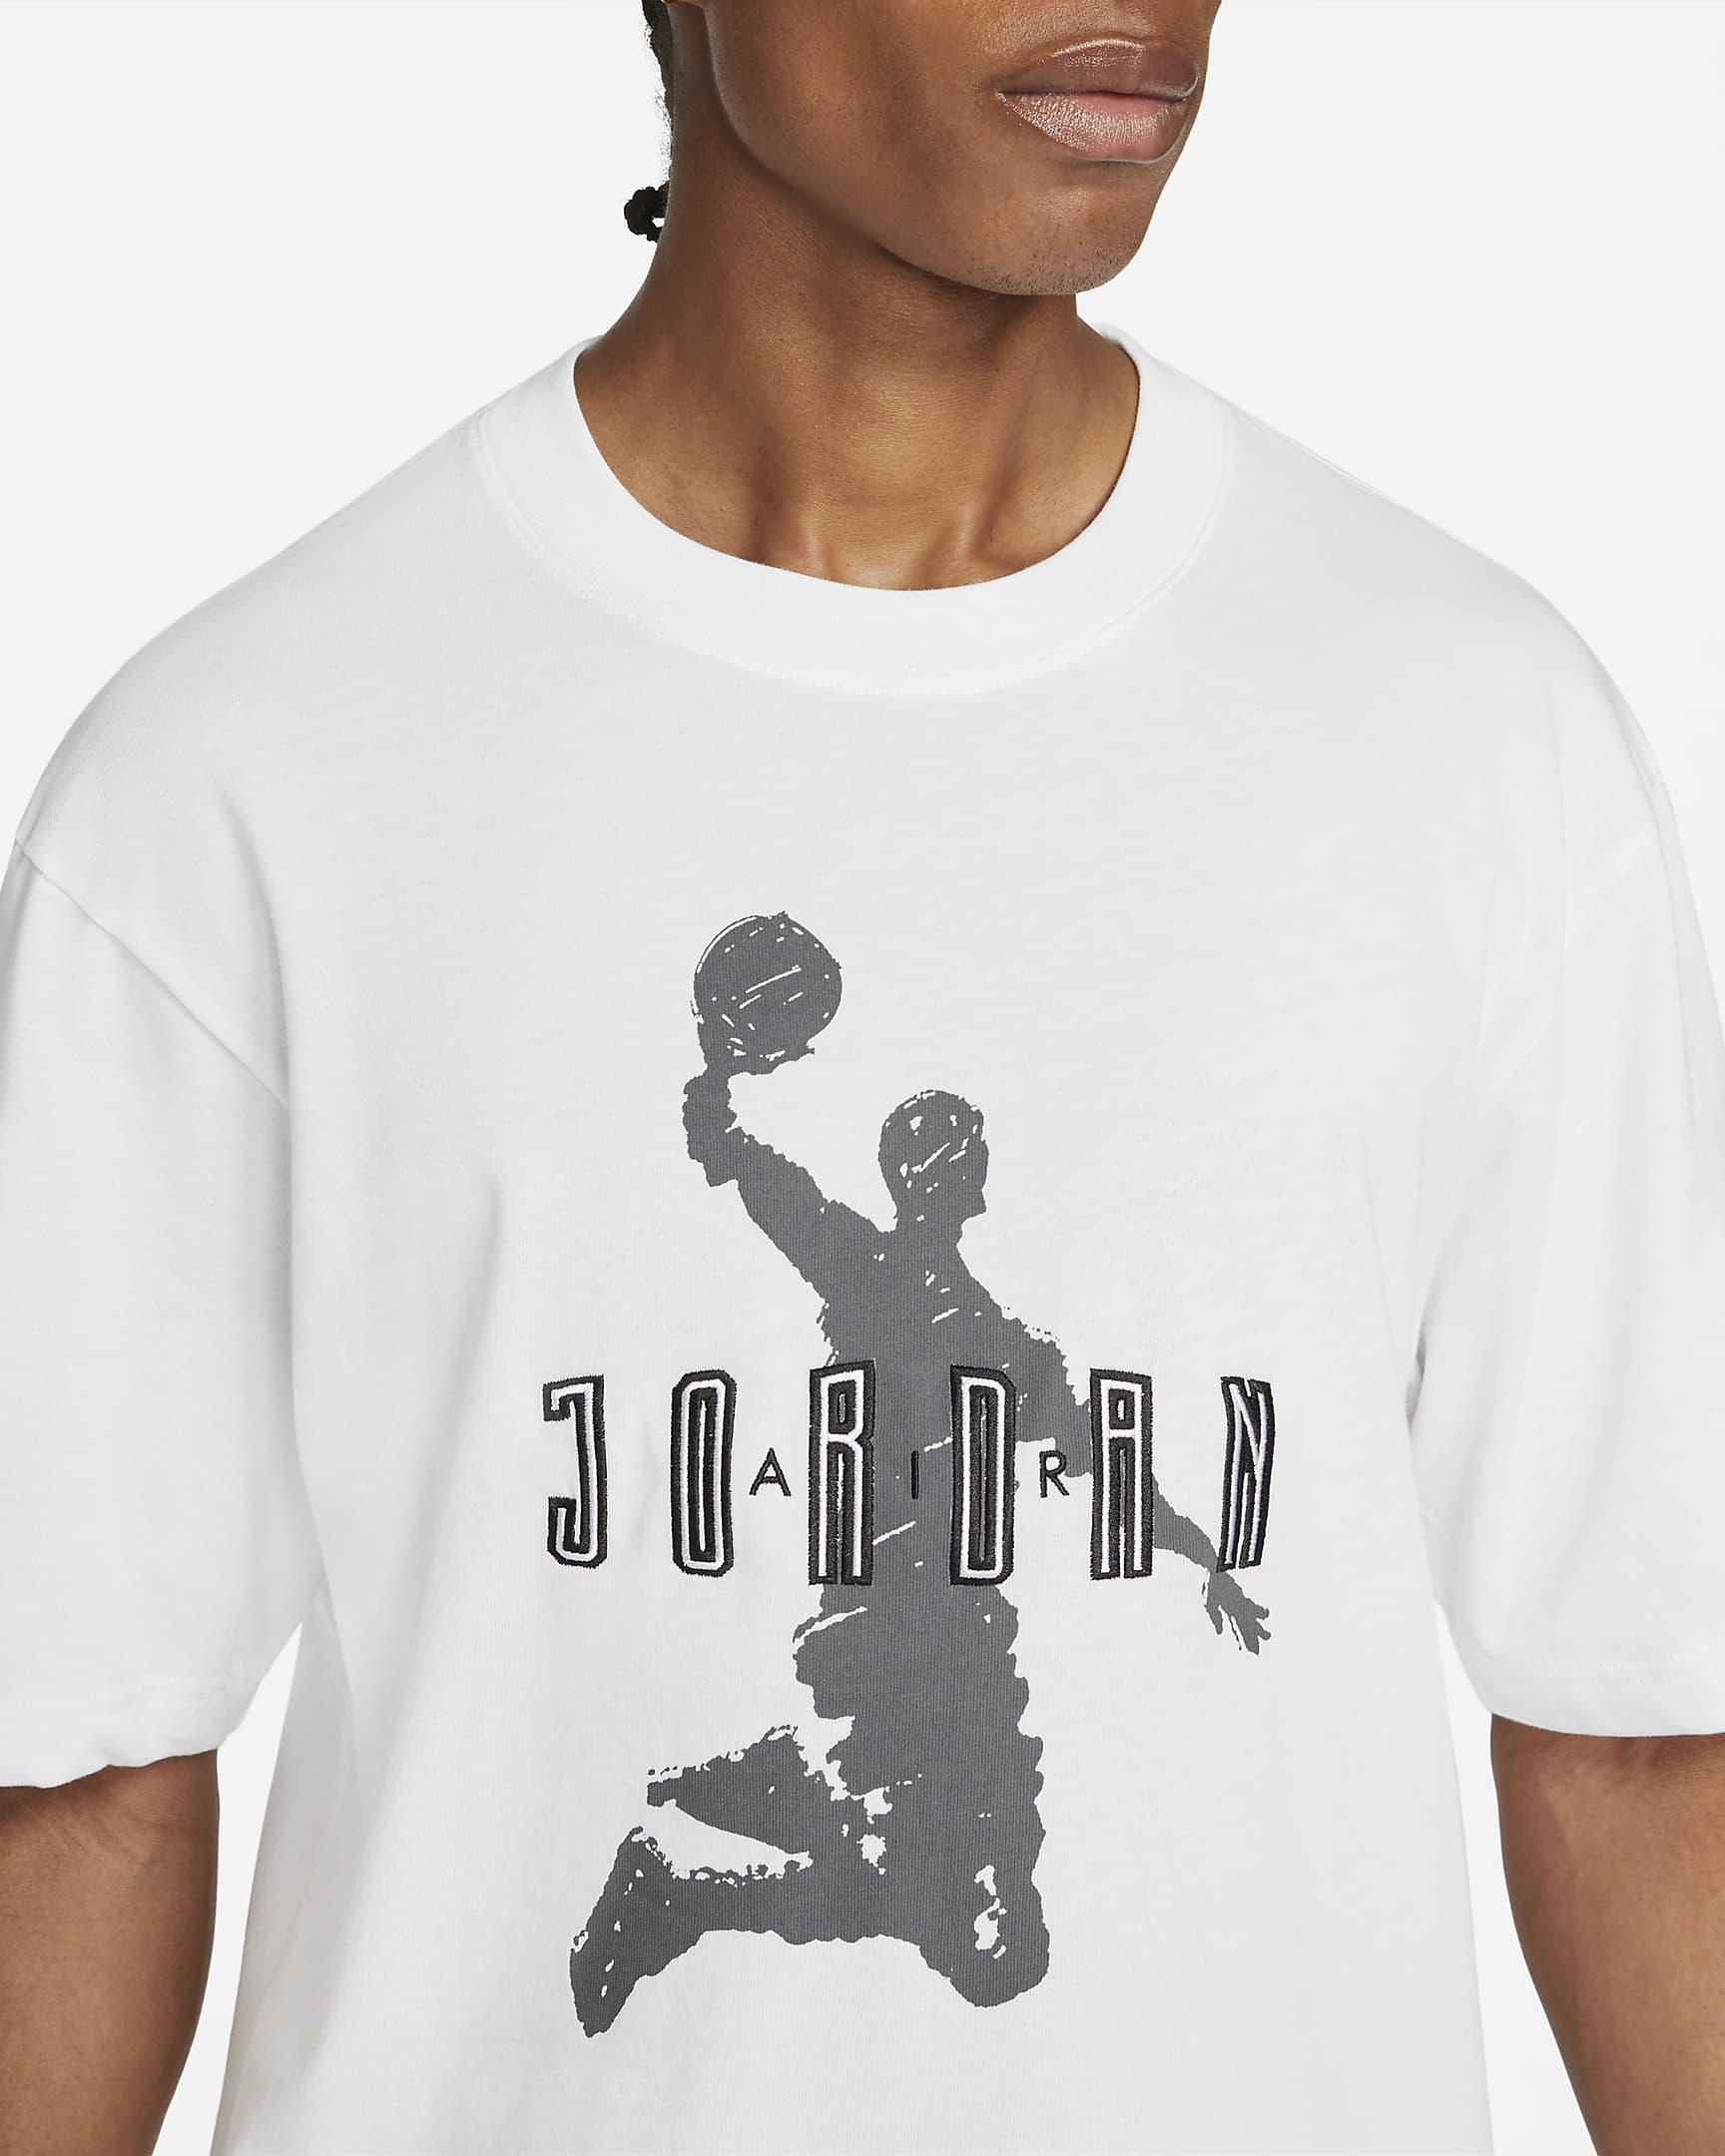 jordan-sport-dna-85-mens-short-sleeve-t-shirt-WS686C-1.png